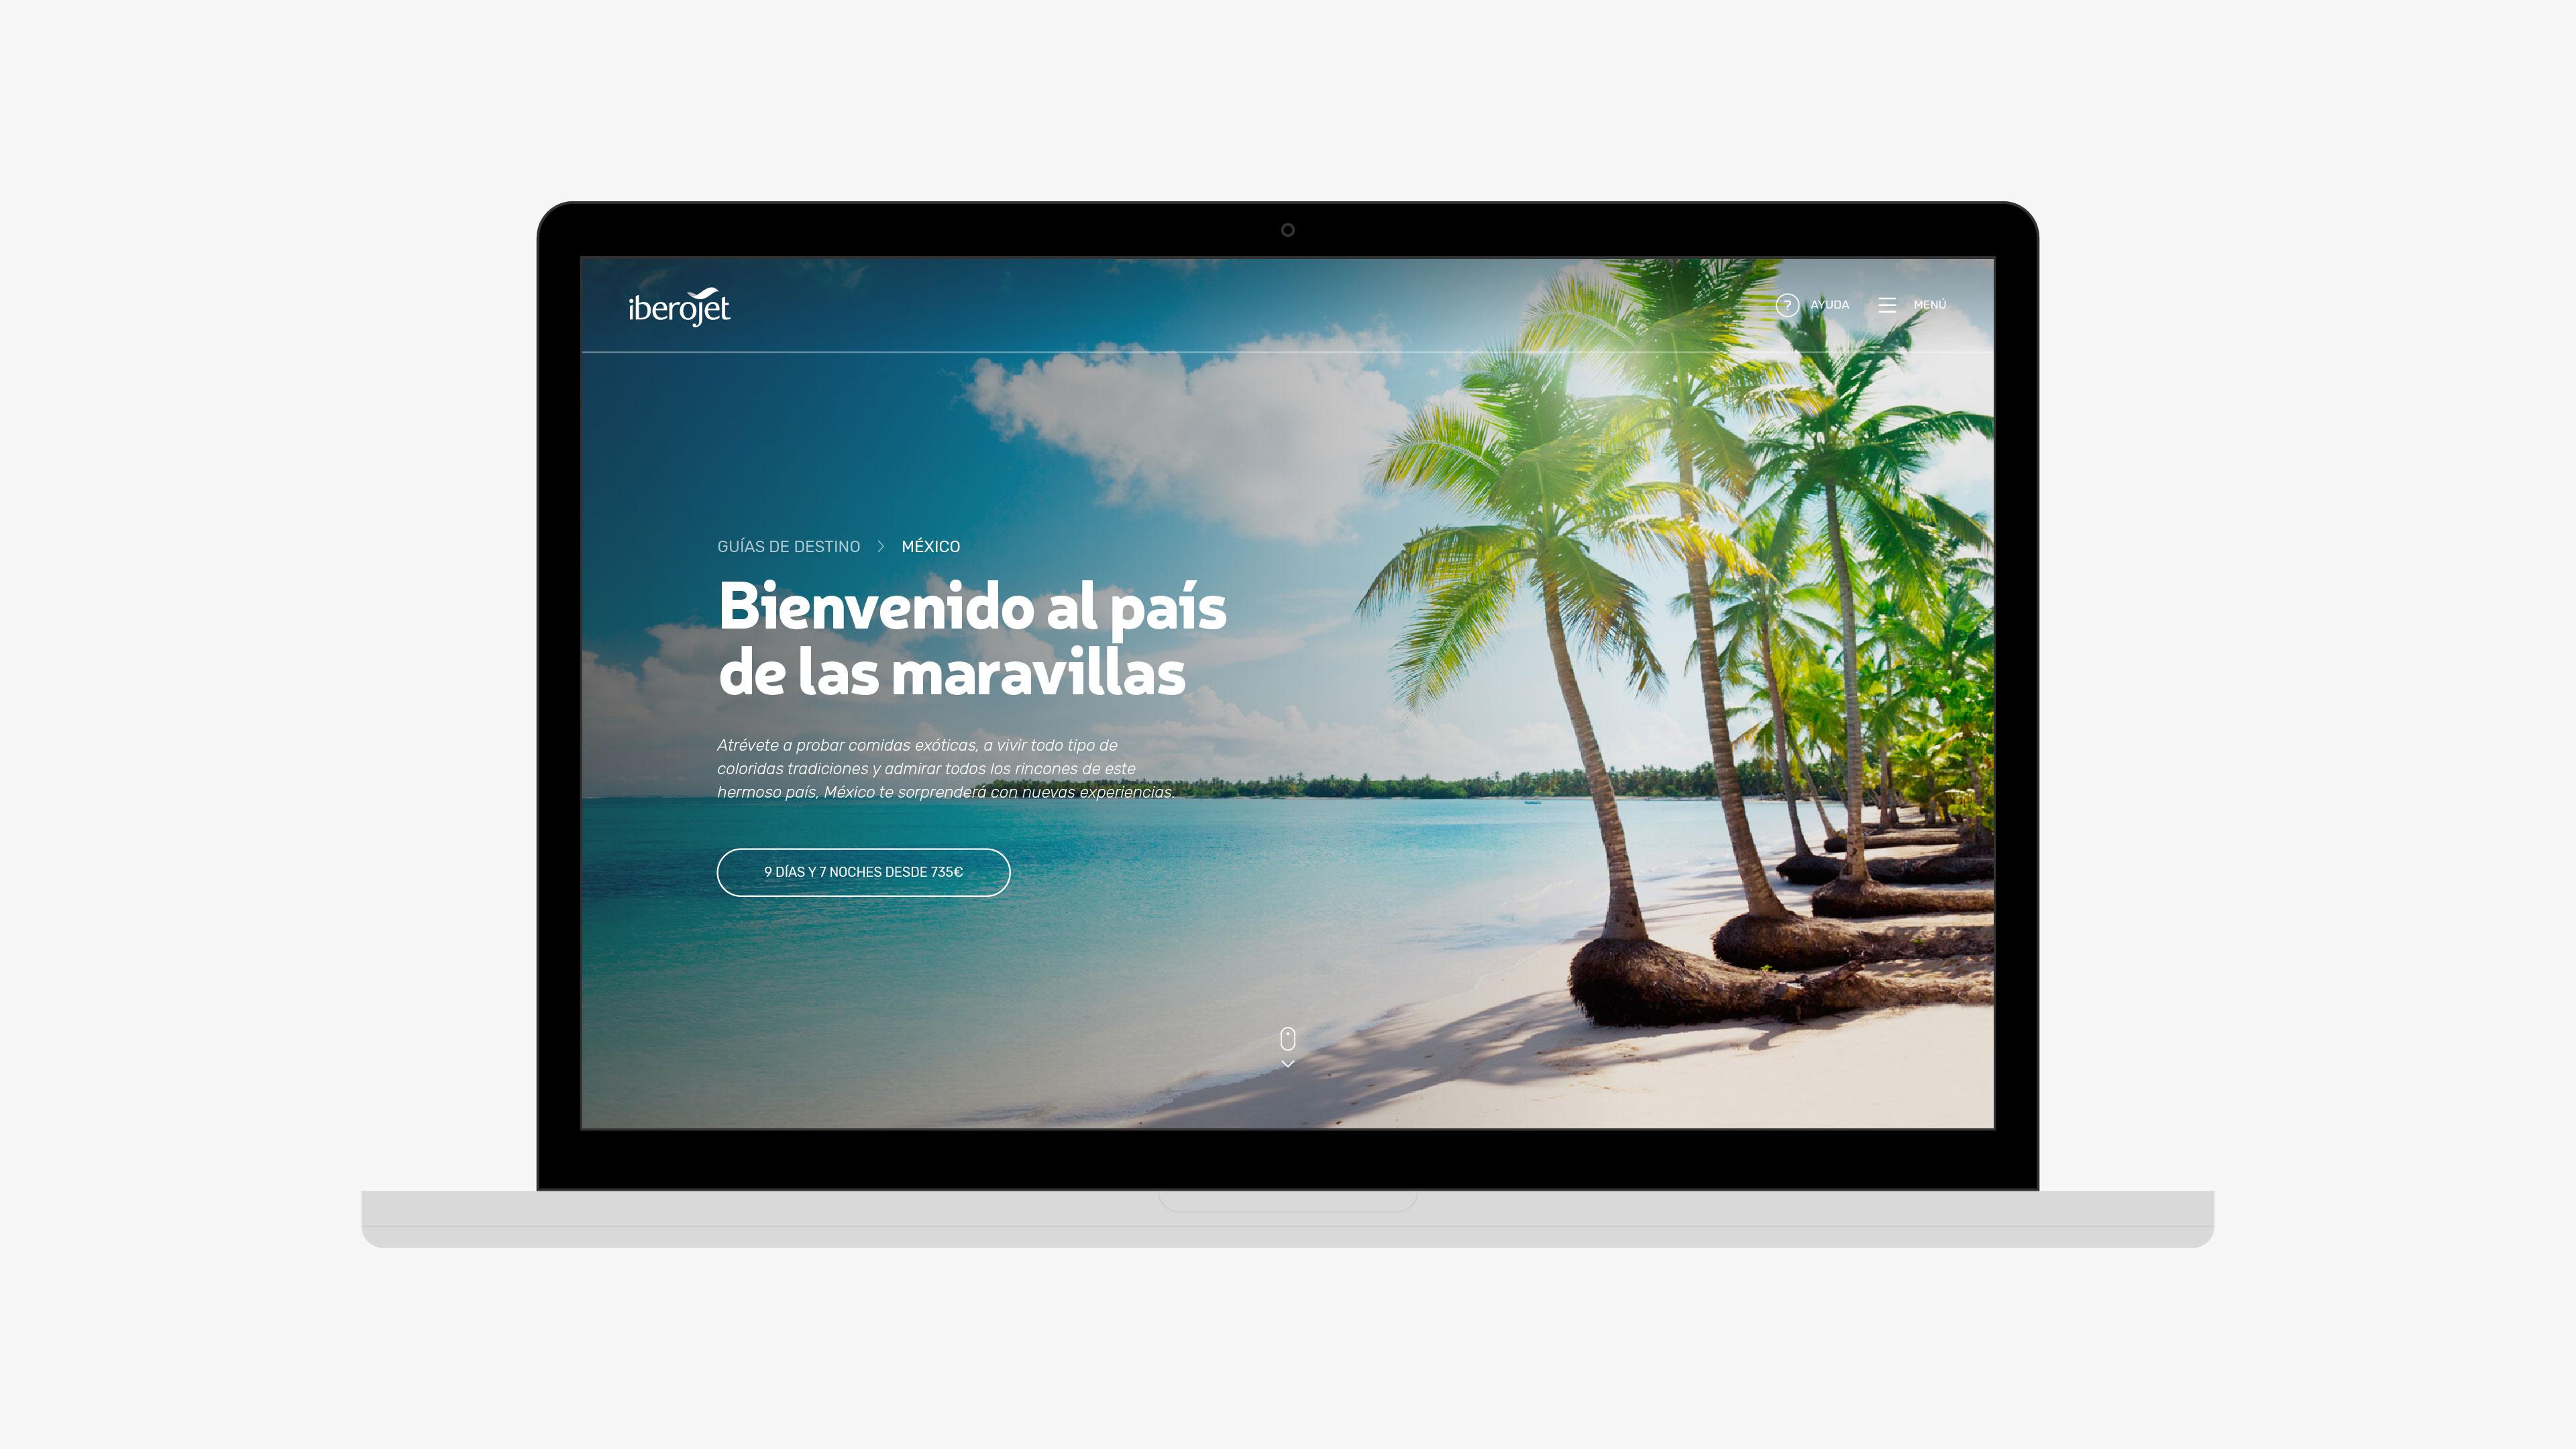 Iberojet guías viaje grupo Barceló web